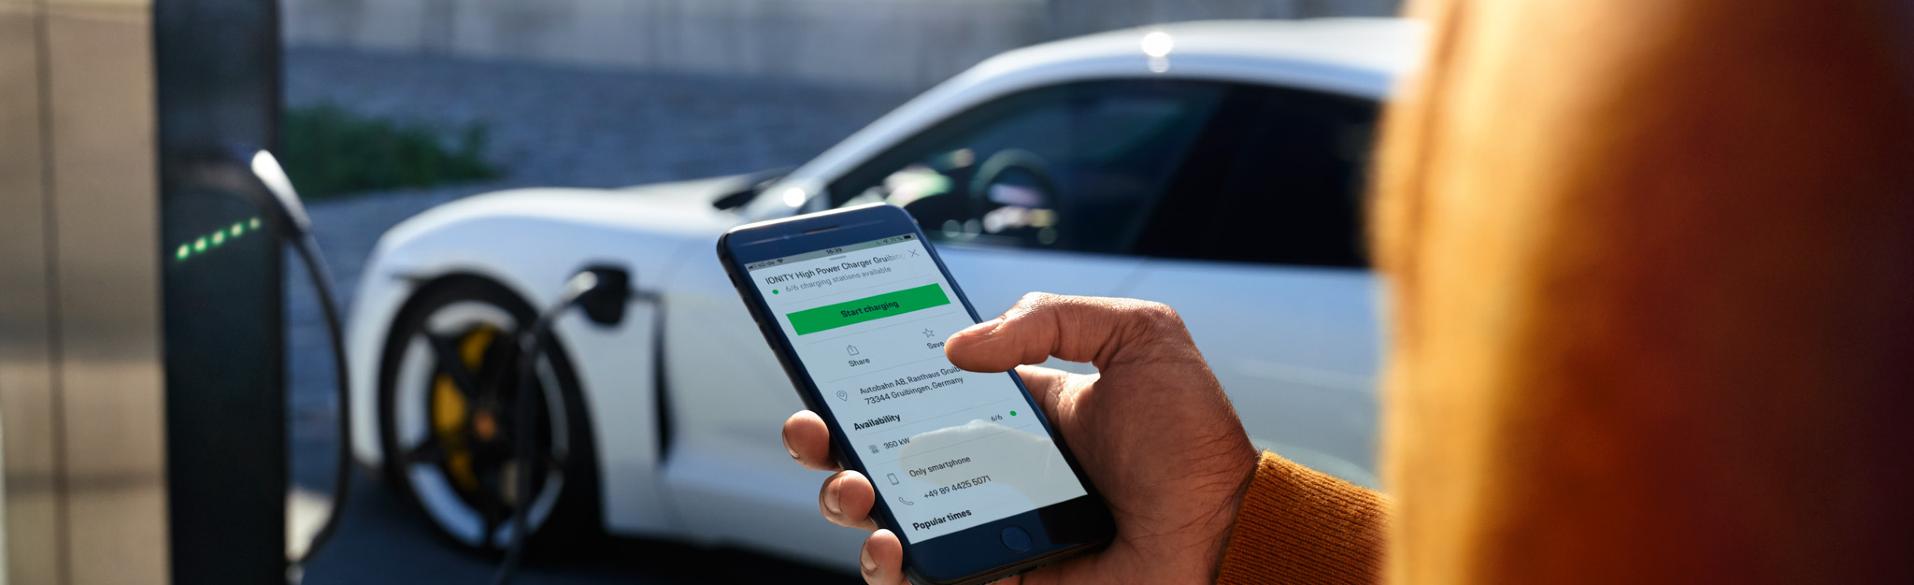 Porsche Taycan Mobile App